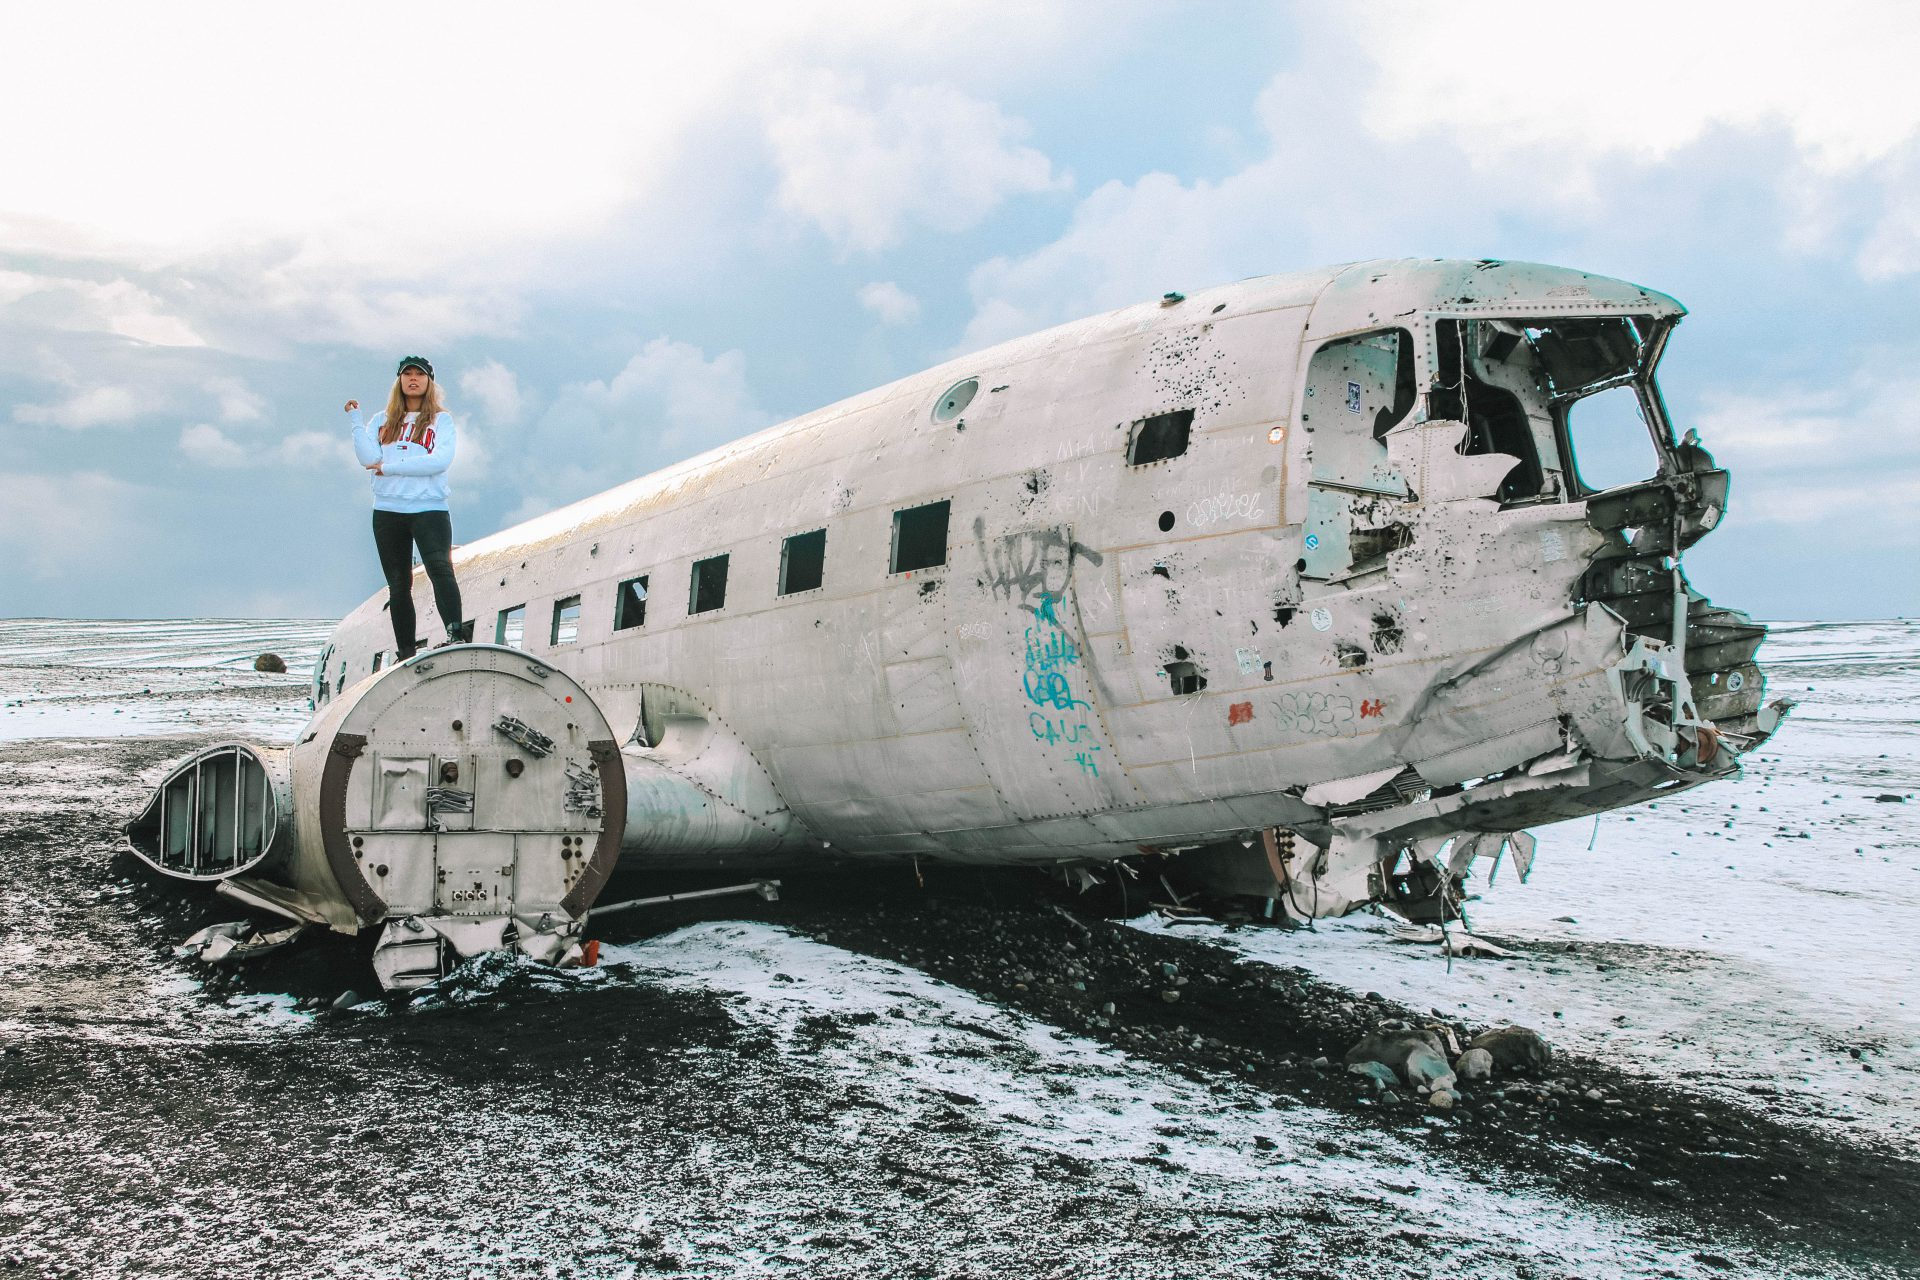 DC-3 Plane Wreck - Road trip Iceland